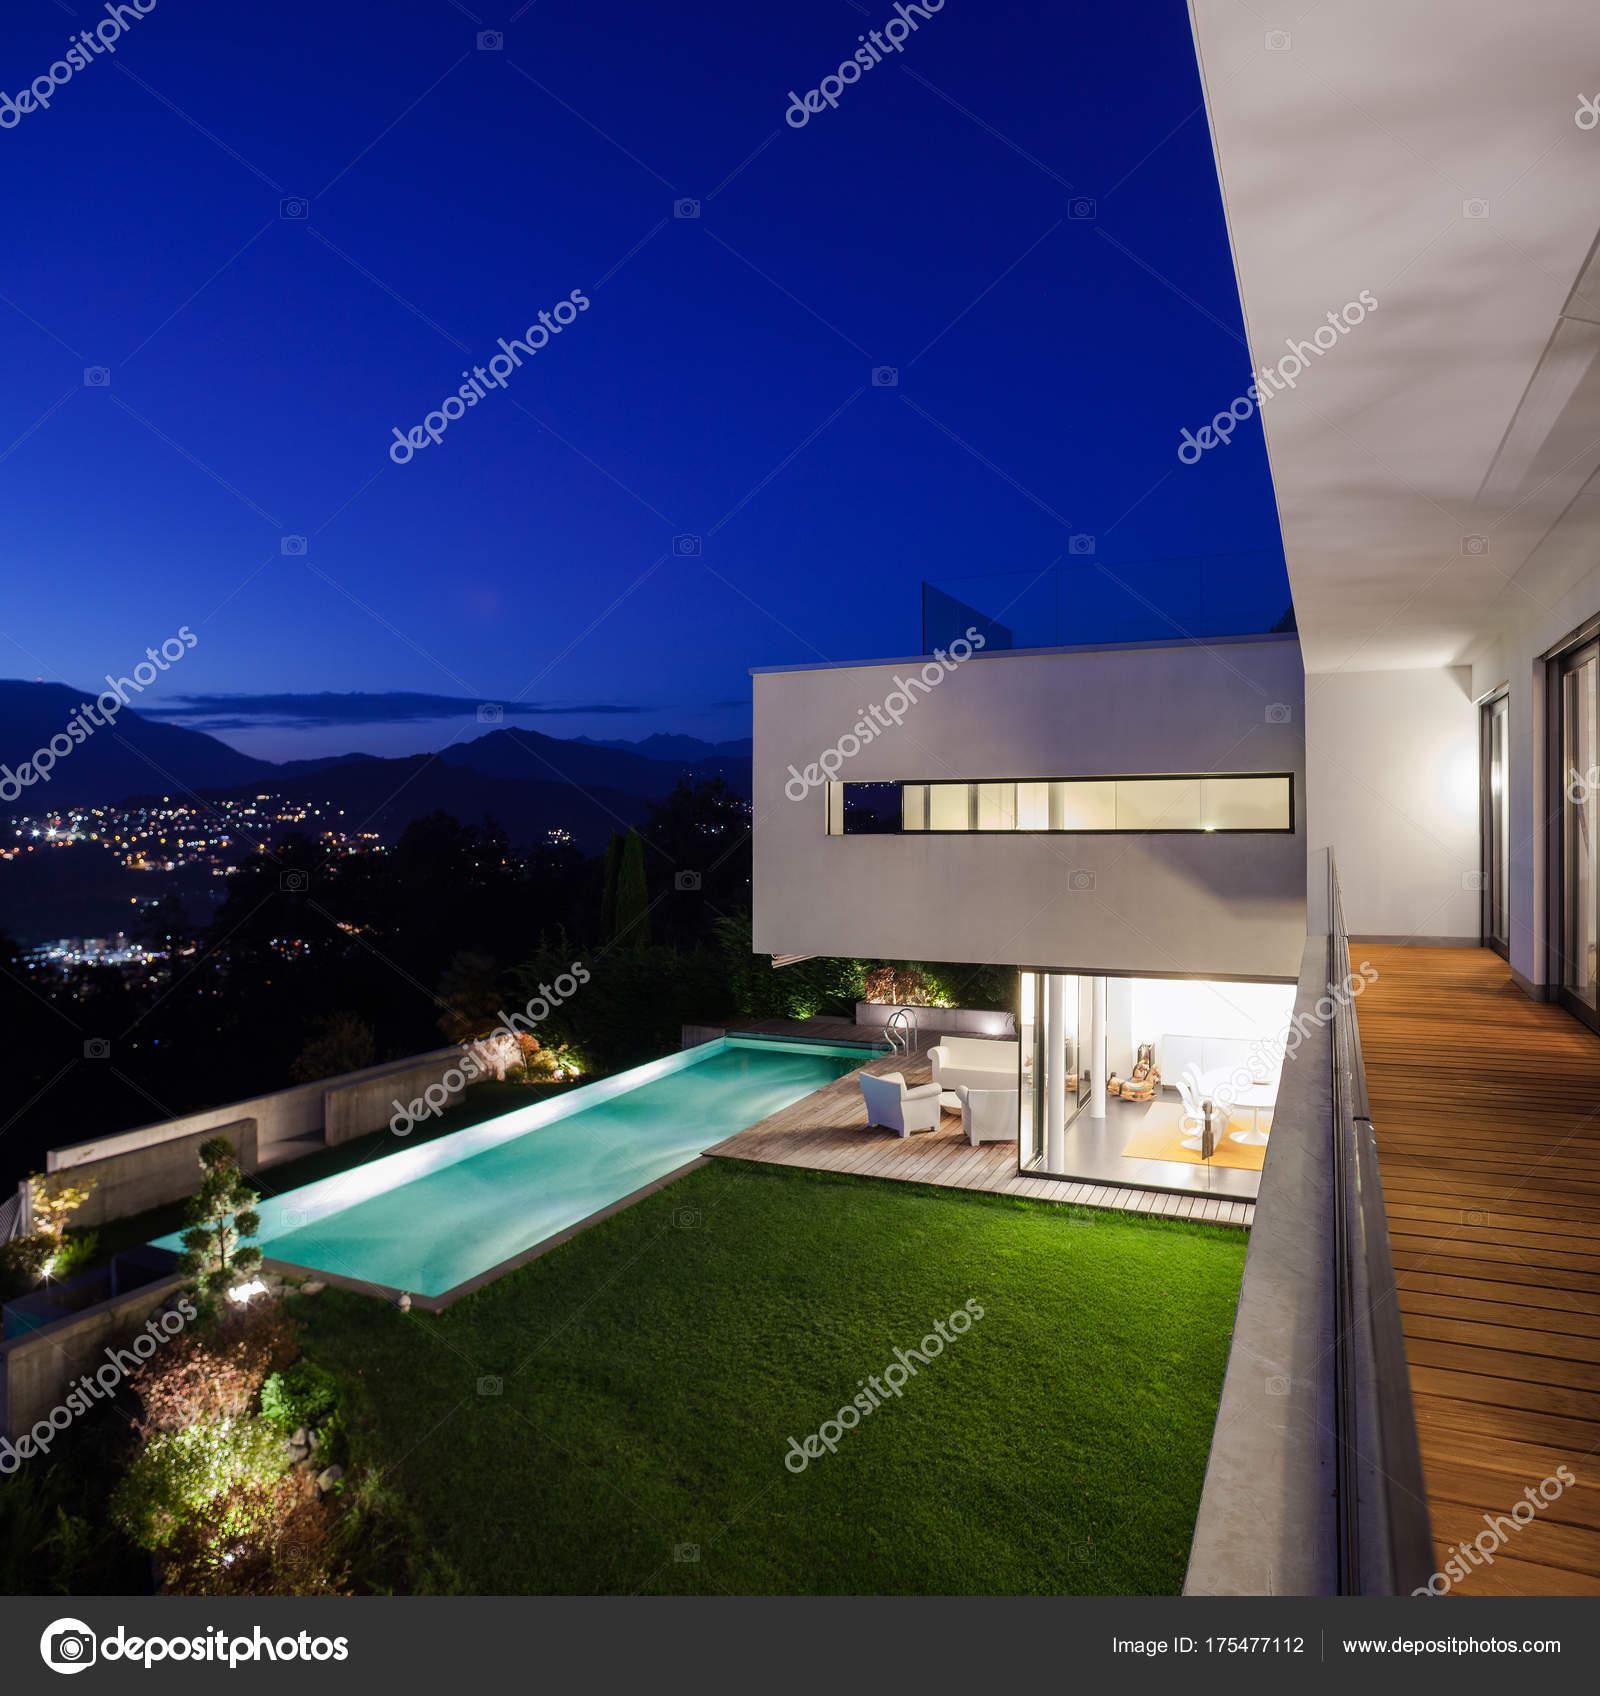 Modernes Haus mit pool — Stockfoto © Zveiger #175477112